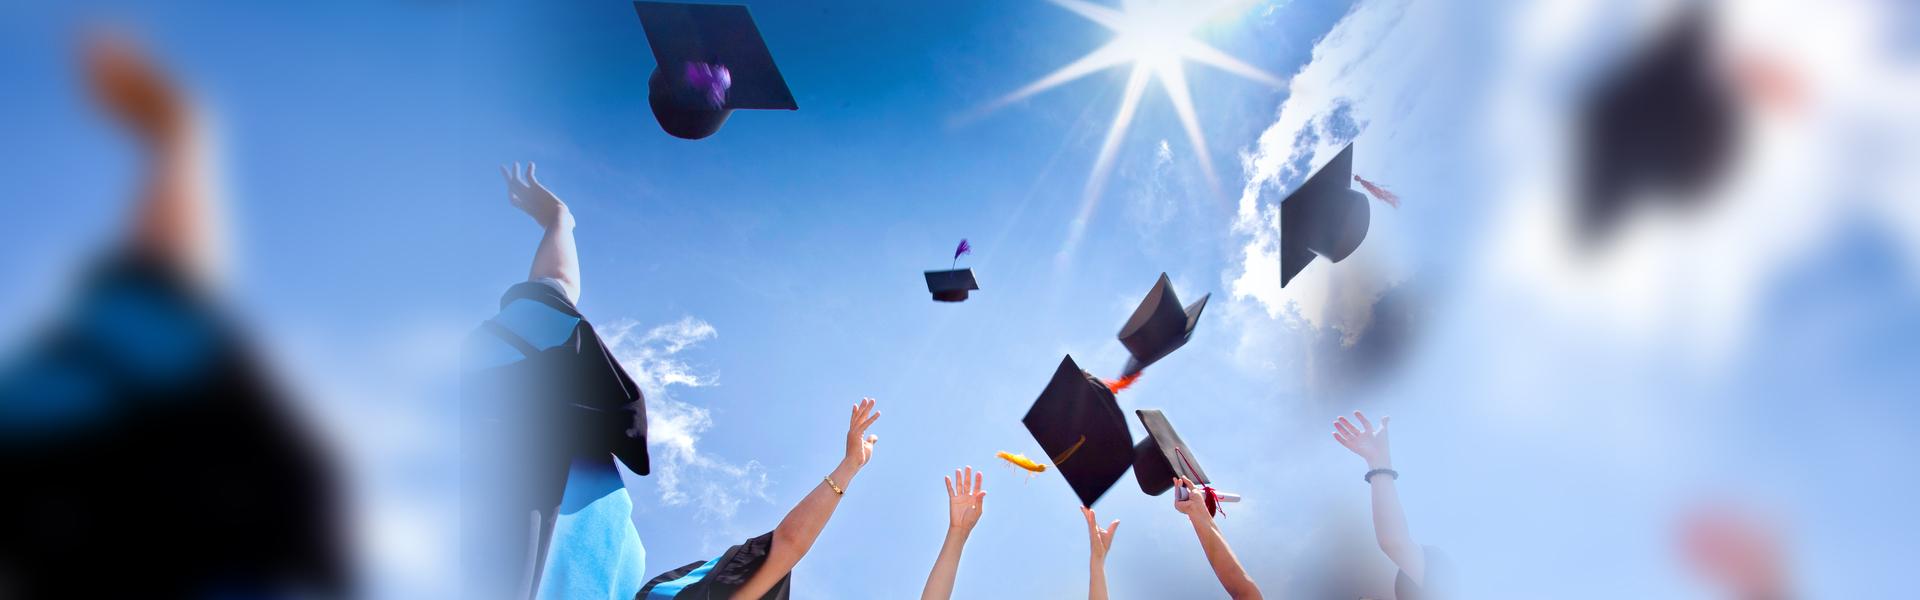 Project Prom / Project Graduation